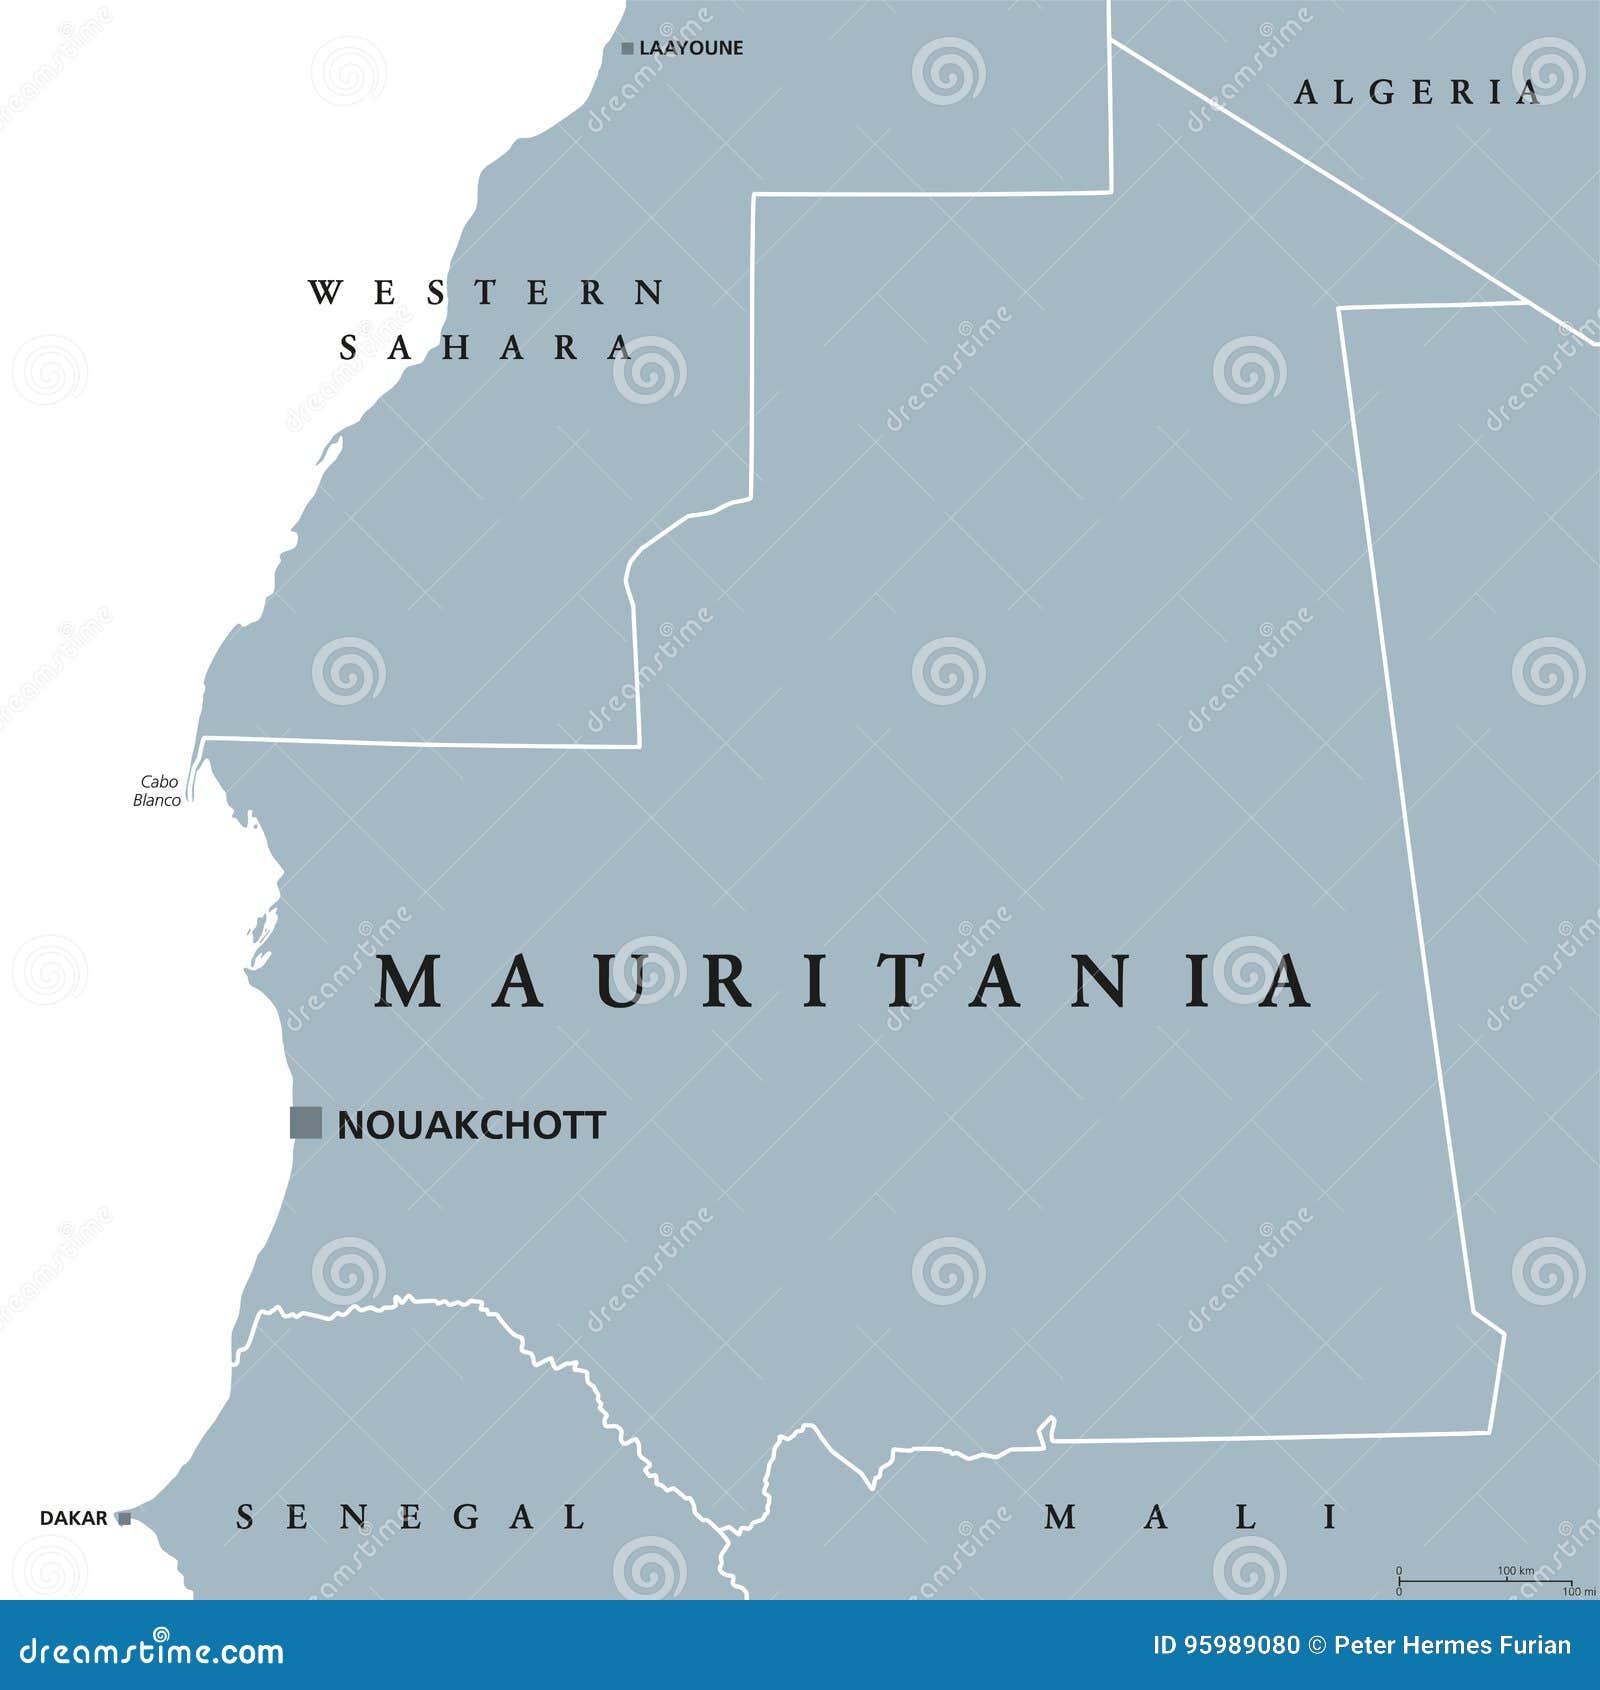 Mauritania political map stock vector illustration of nouakchott download comp ccuart Gallery